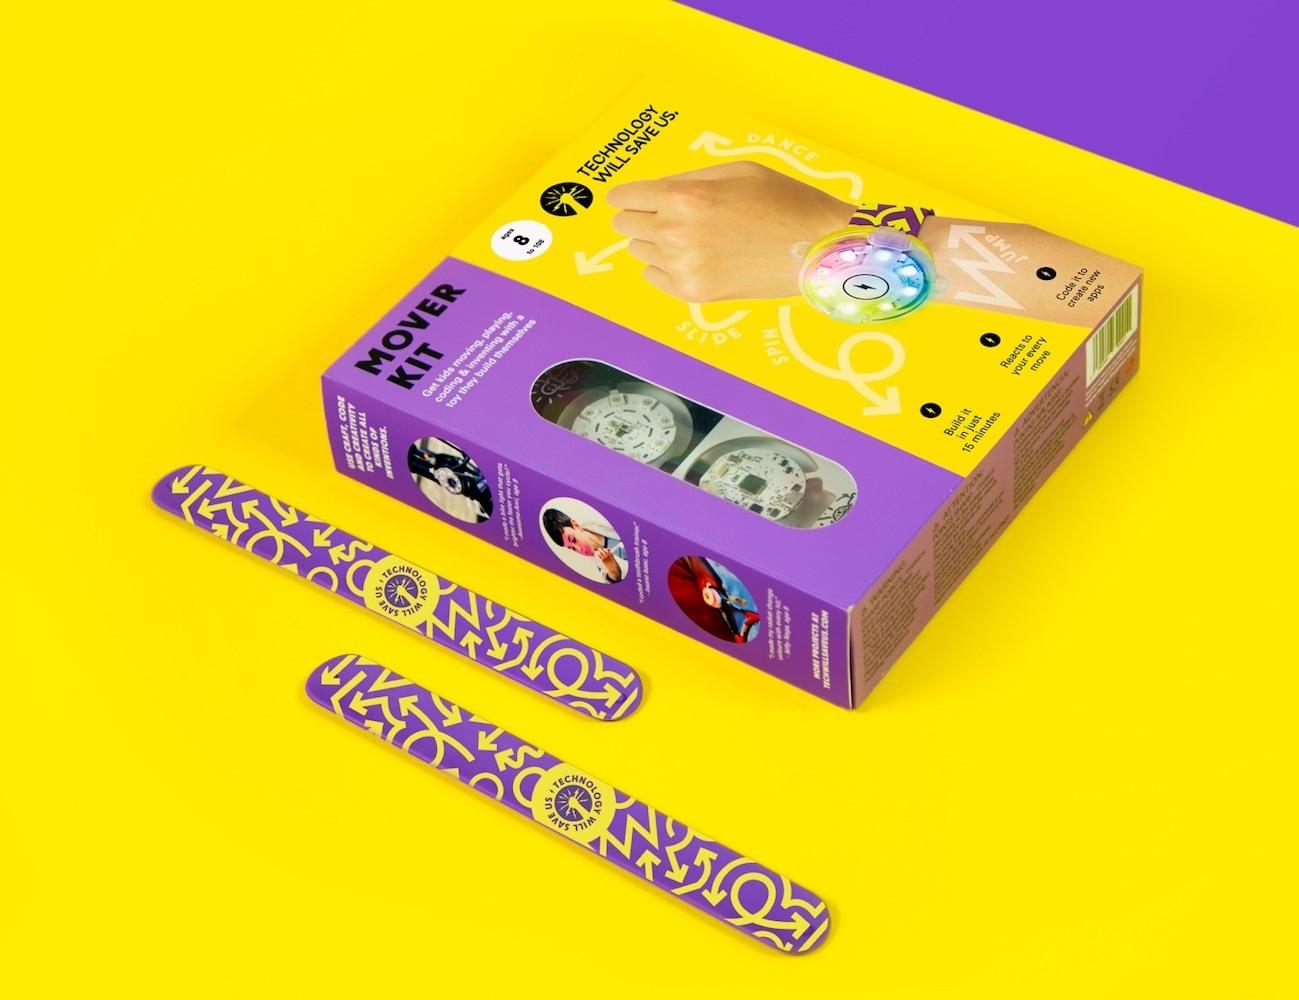 mover-kit-diy-programming-kit-for-kids-3